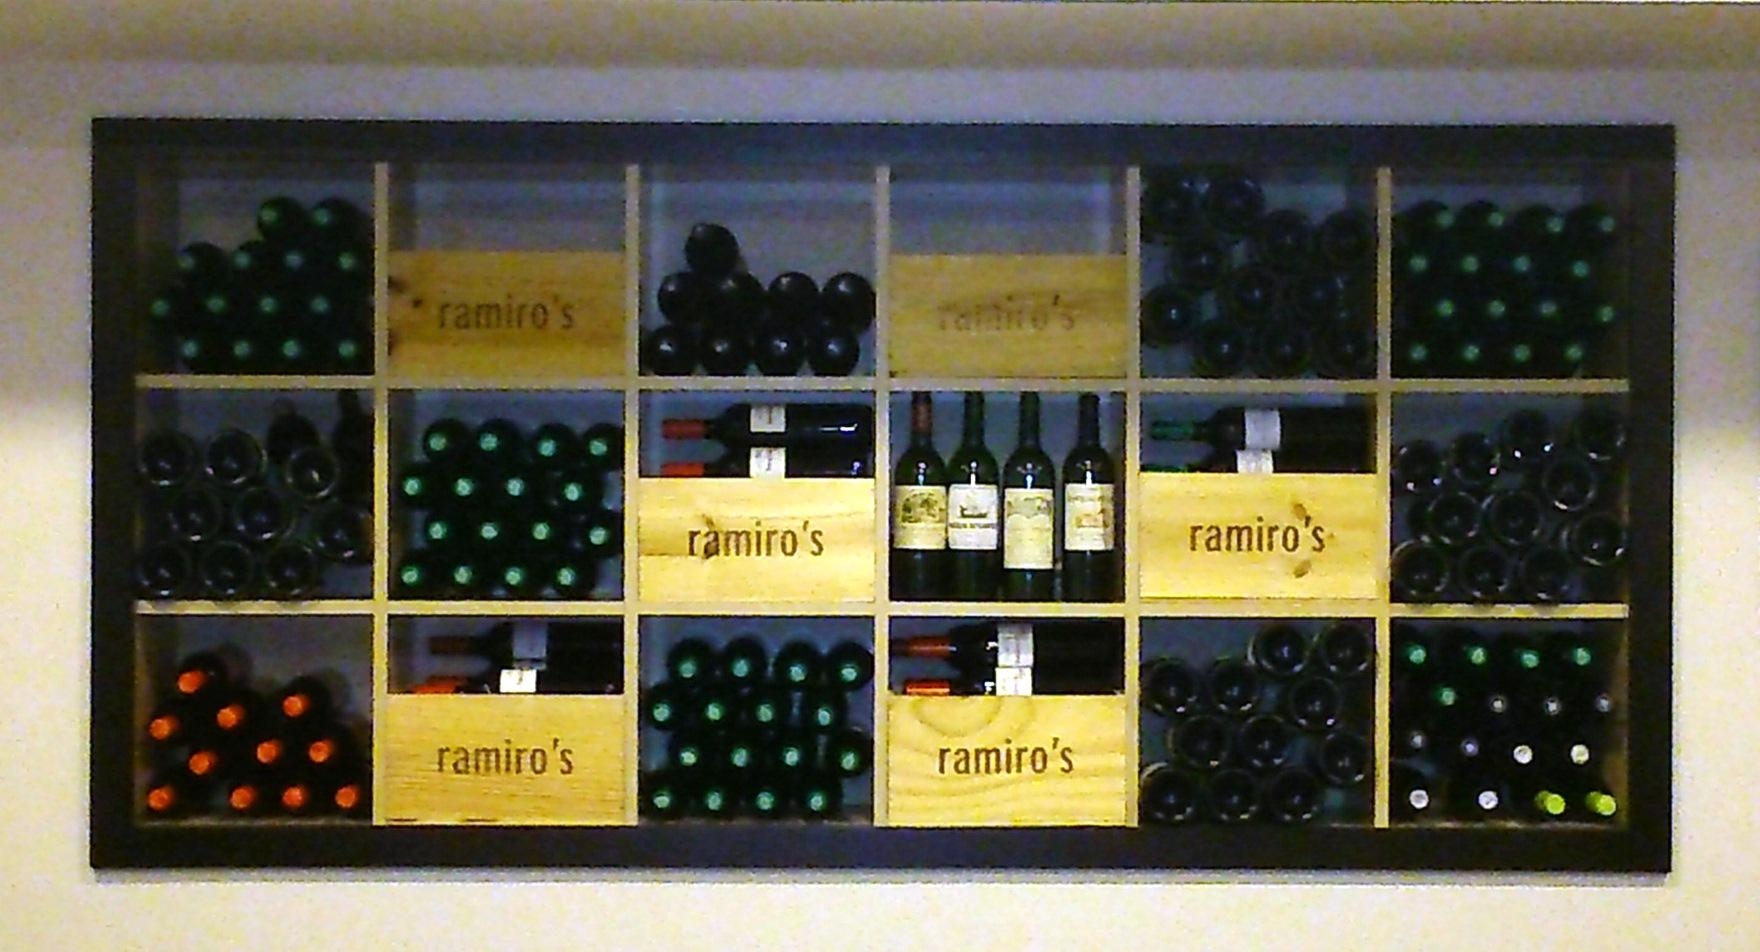 Ramiro s tapas wine bar tradici n puesta al d a bacoman a for Decoracion de bares de tapas